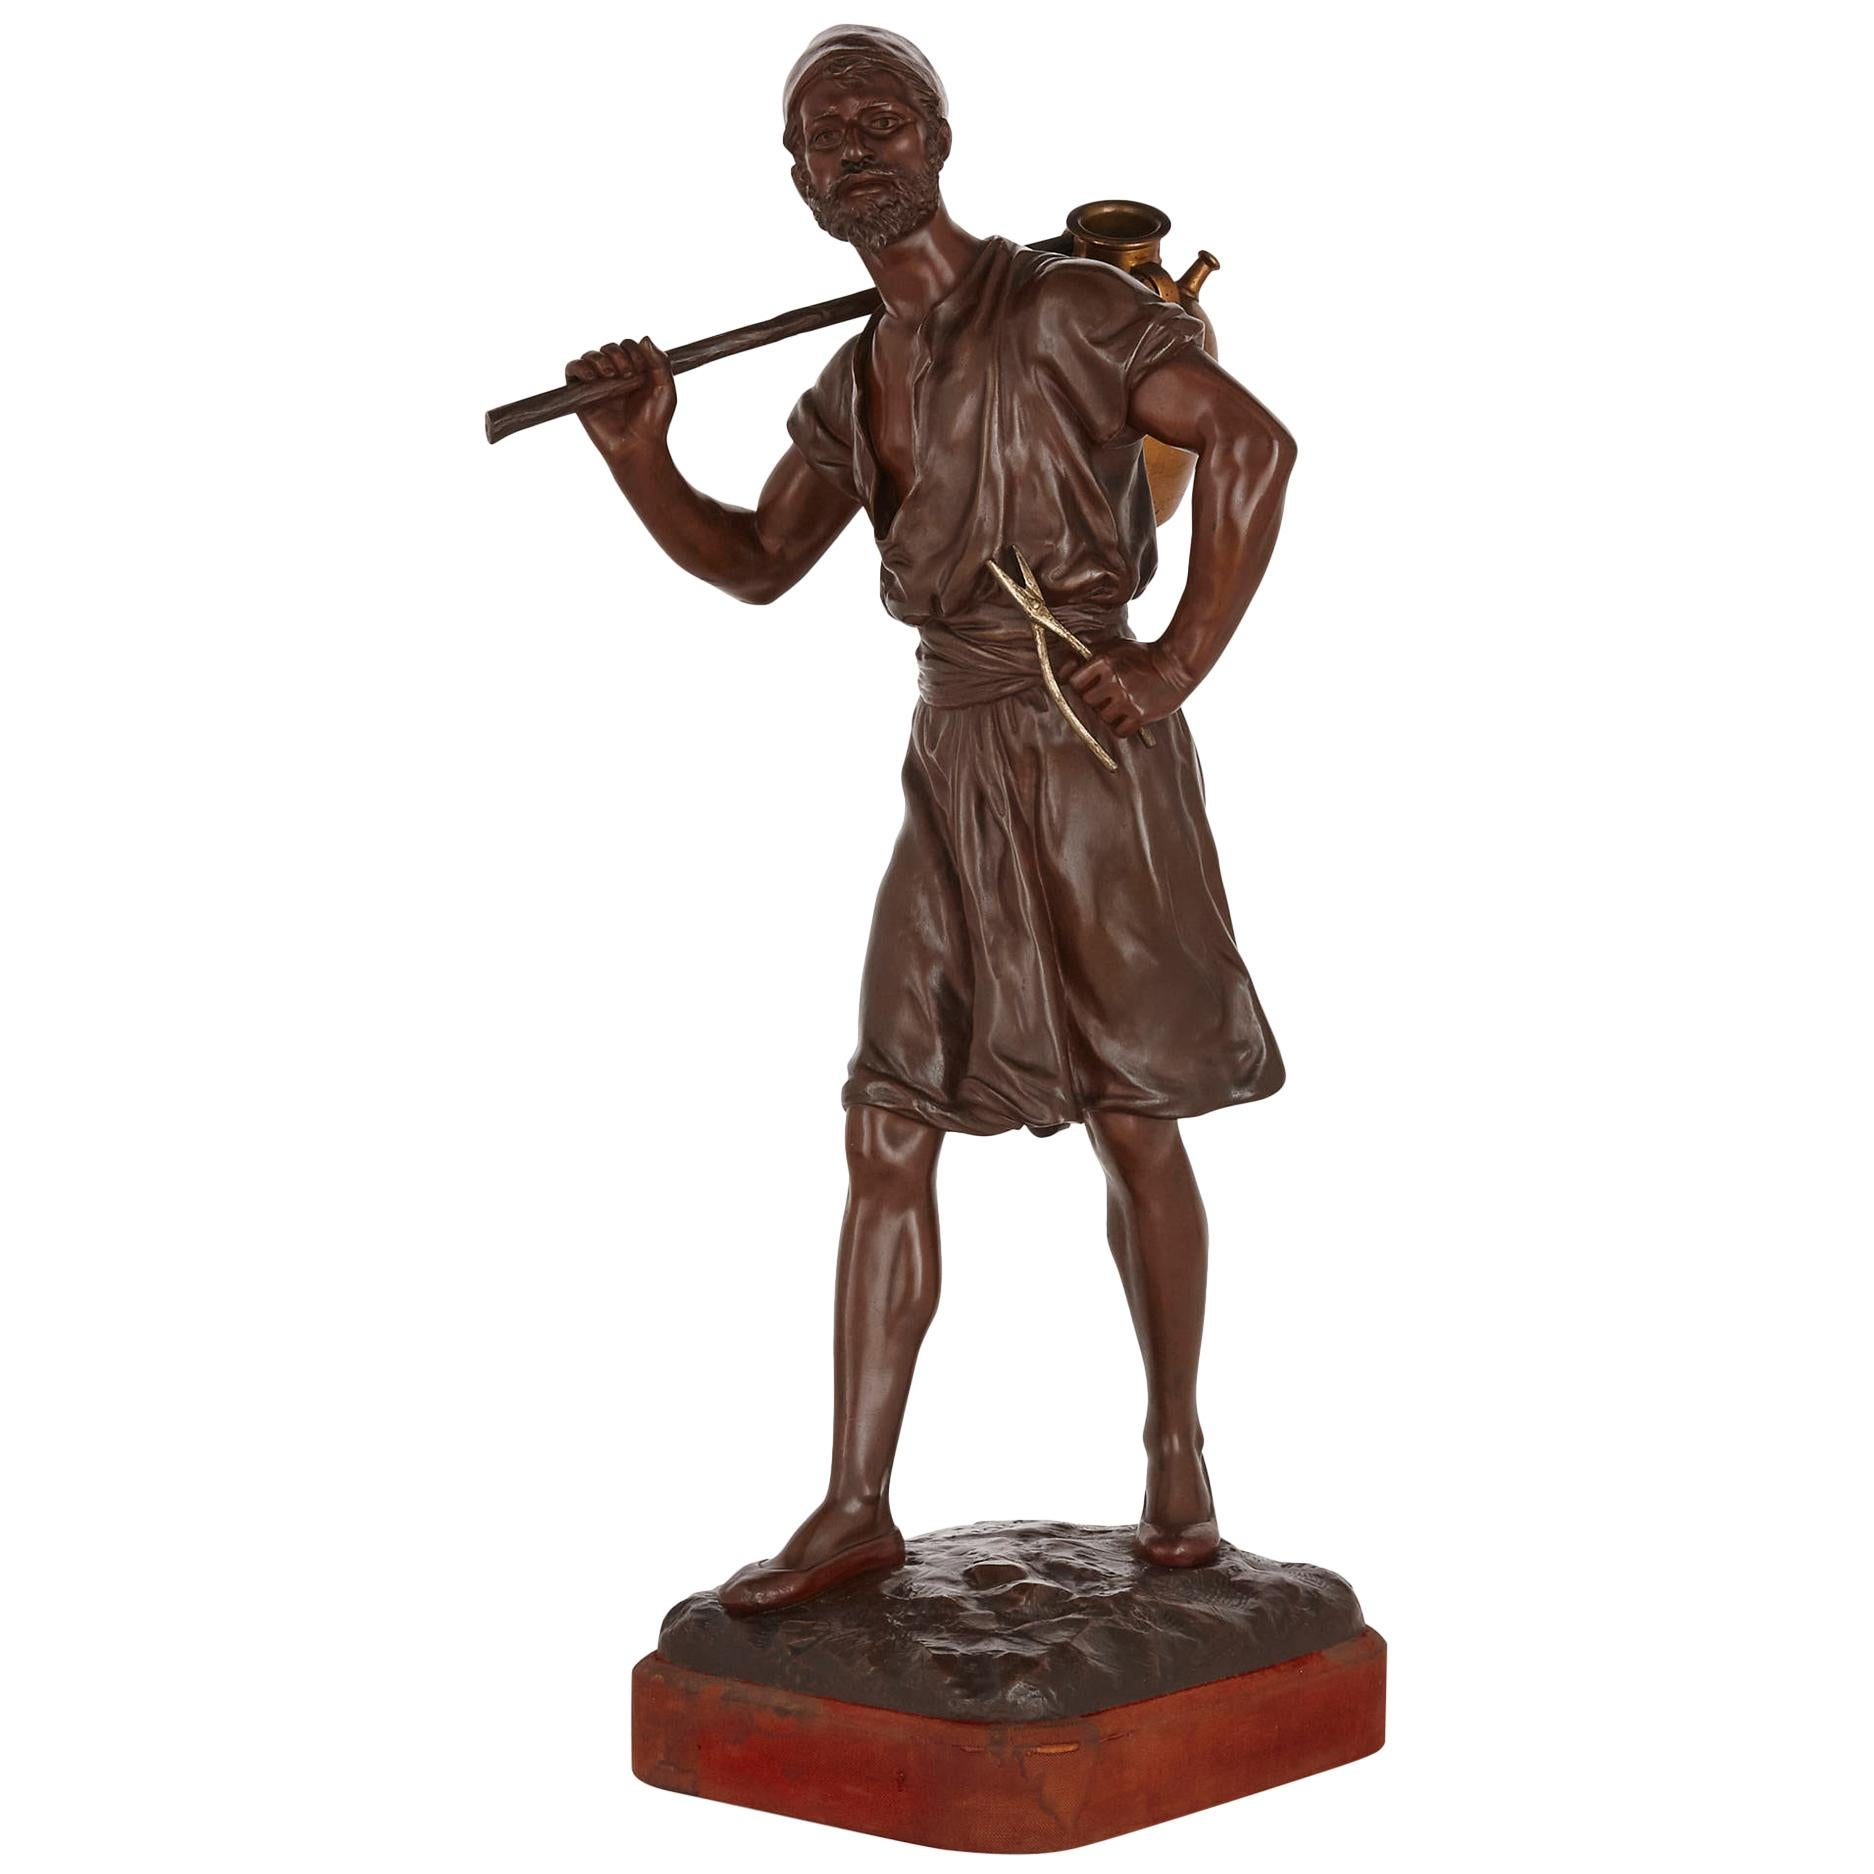 Orientalist Bronze Figure of a Water Carrier by Marcel Debut